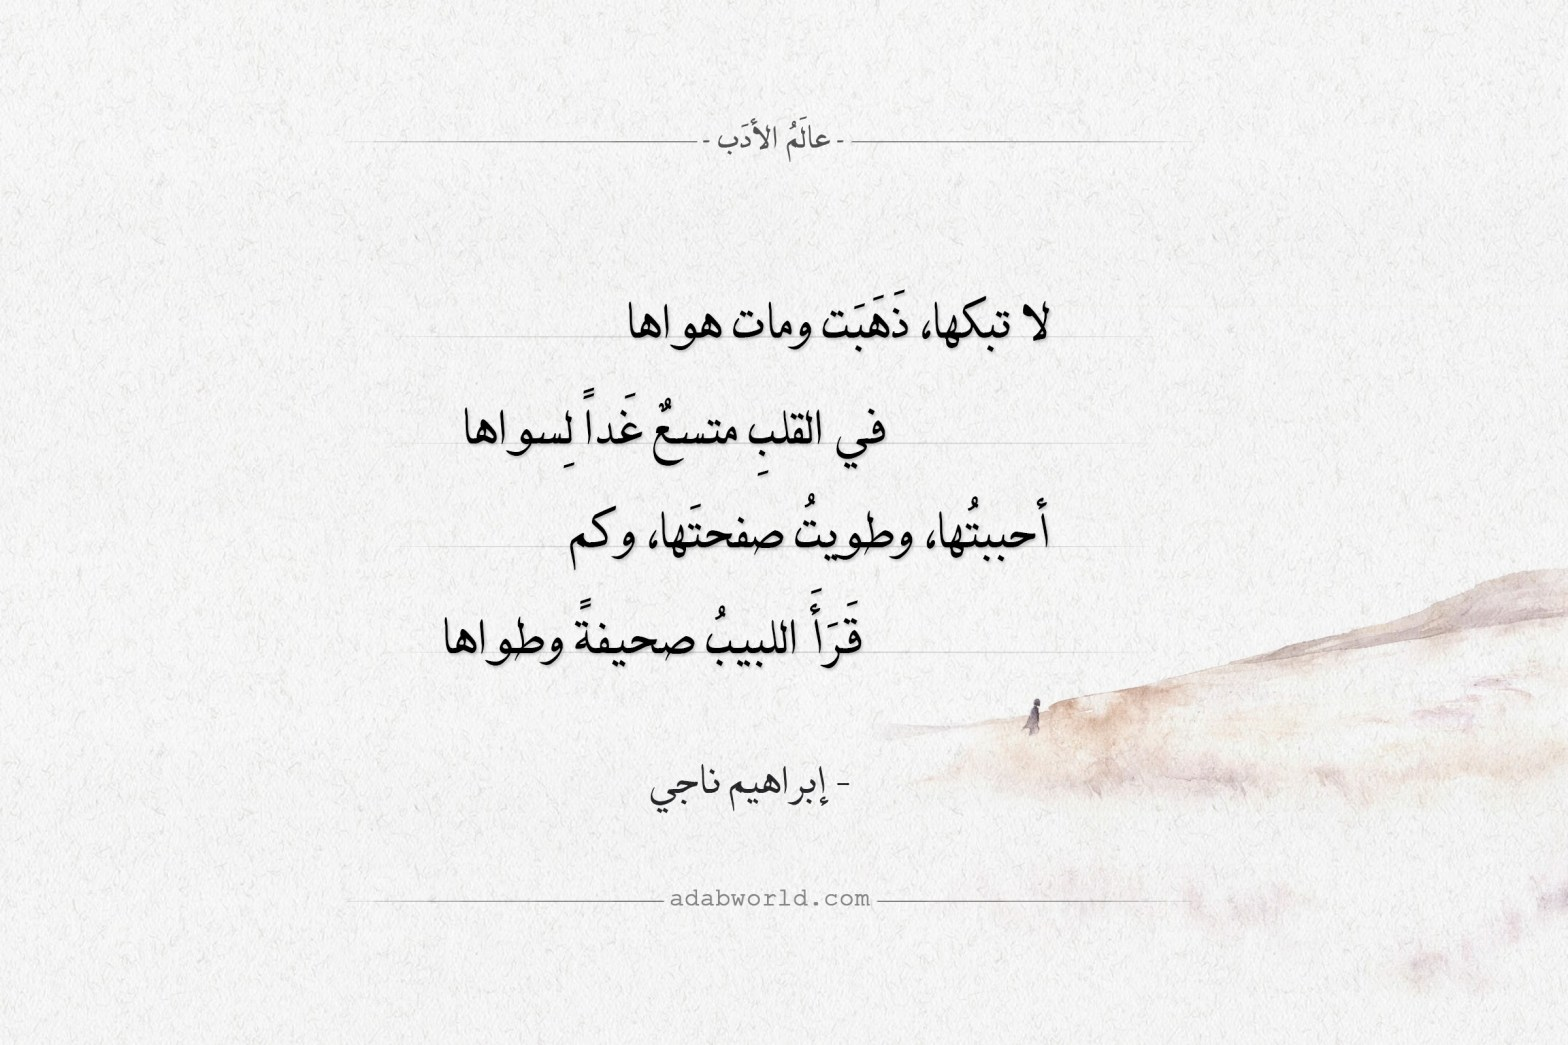 شعر إبراهيم ناجي - لا تبكها ذهبت ومات هواها